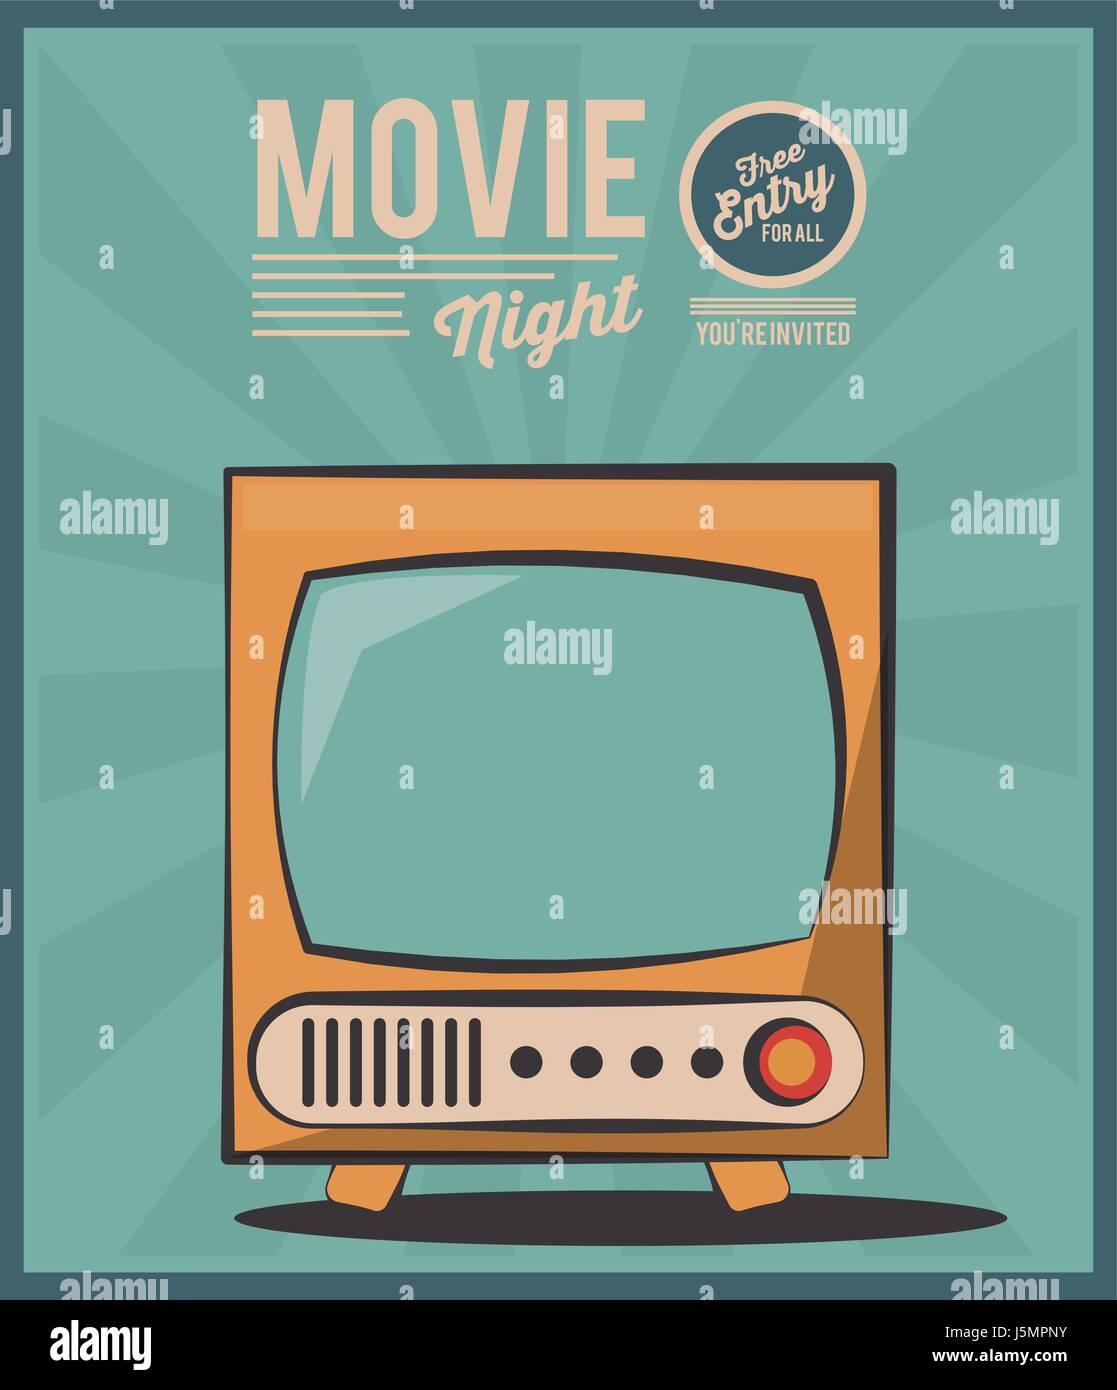 Vintage Karte Film Nacht Fernsehbild Einladung Vektor Abbildung ...